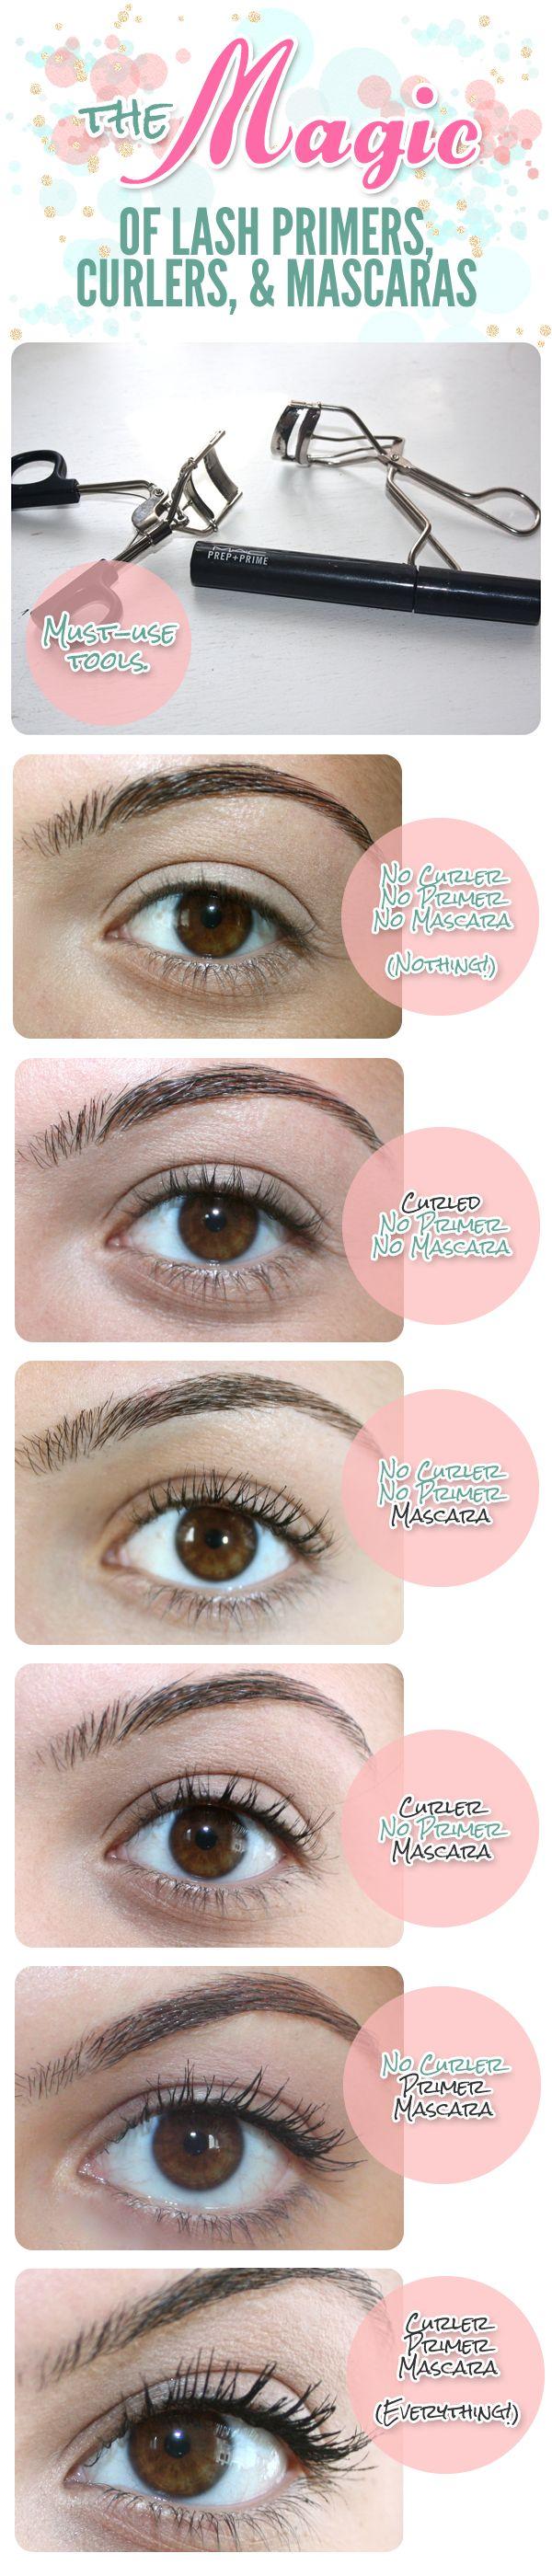 Eyelash Curling vs. Eyelash Priming – What Really Makes A Difference?